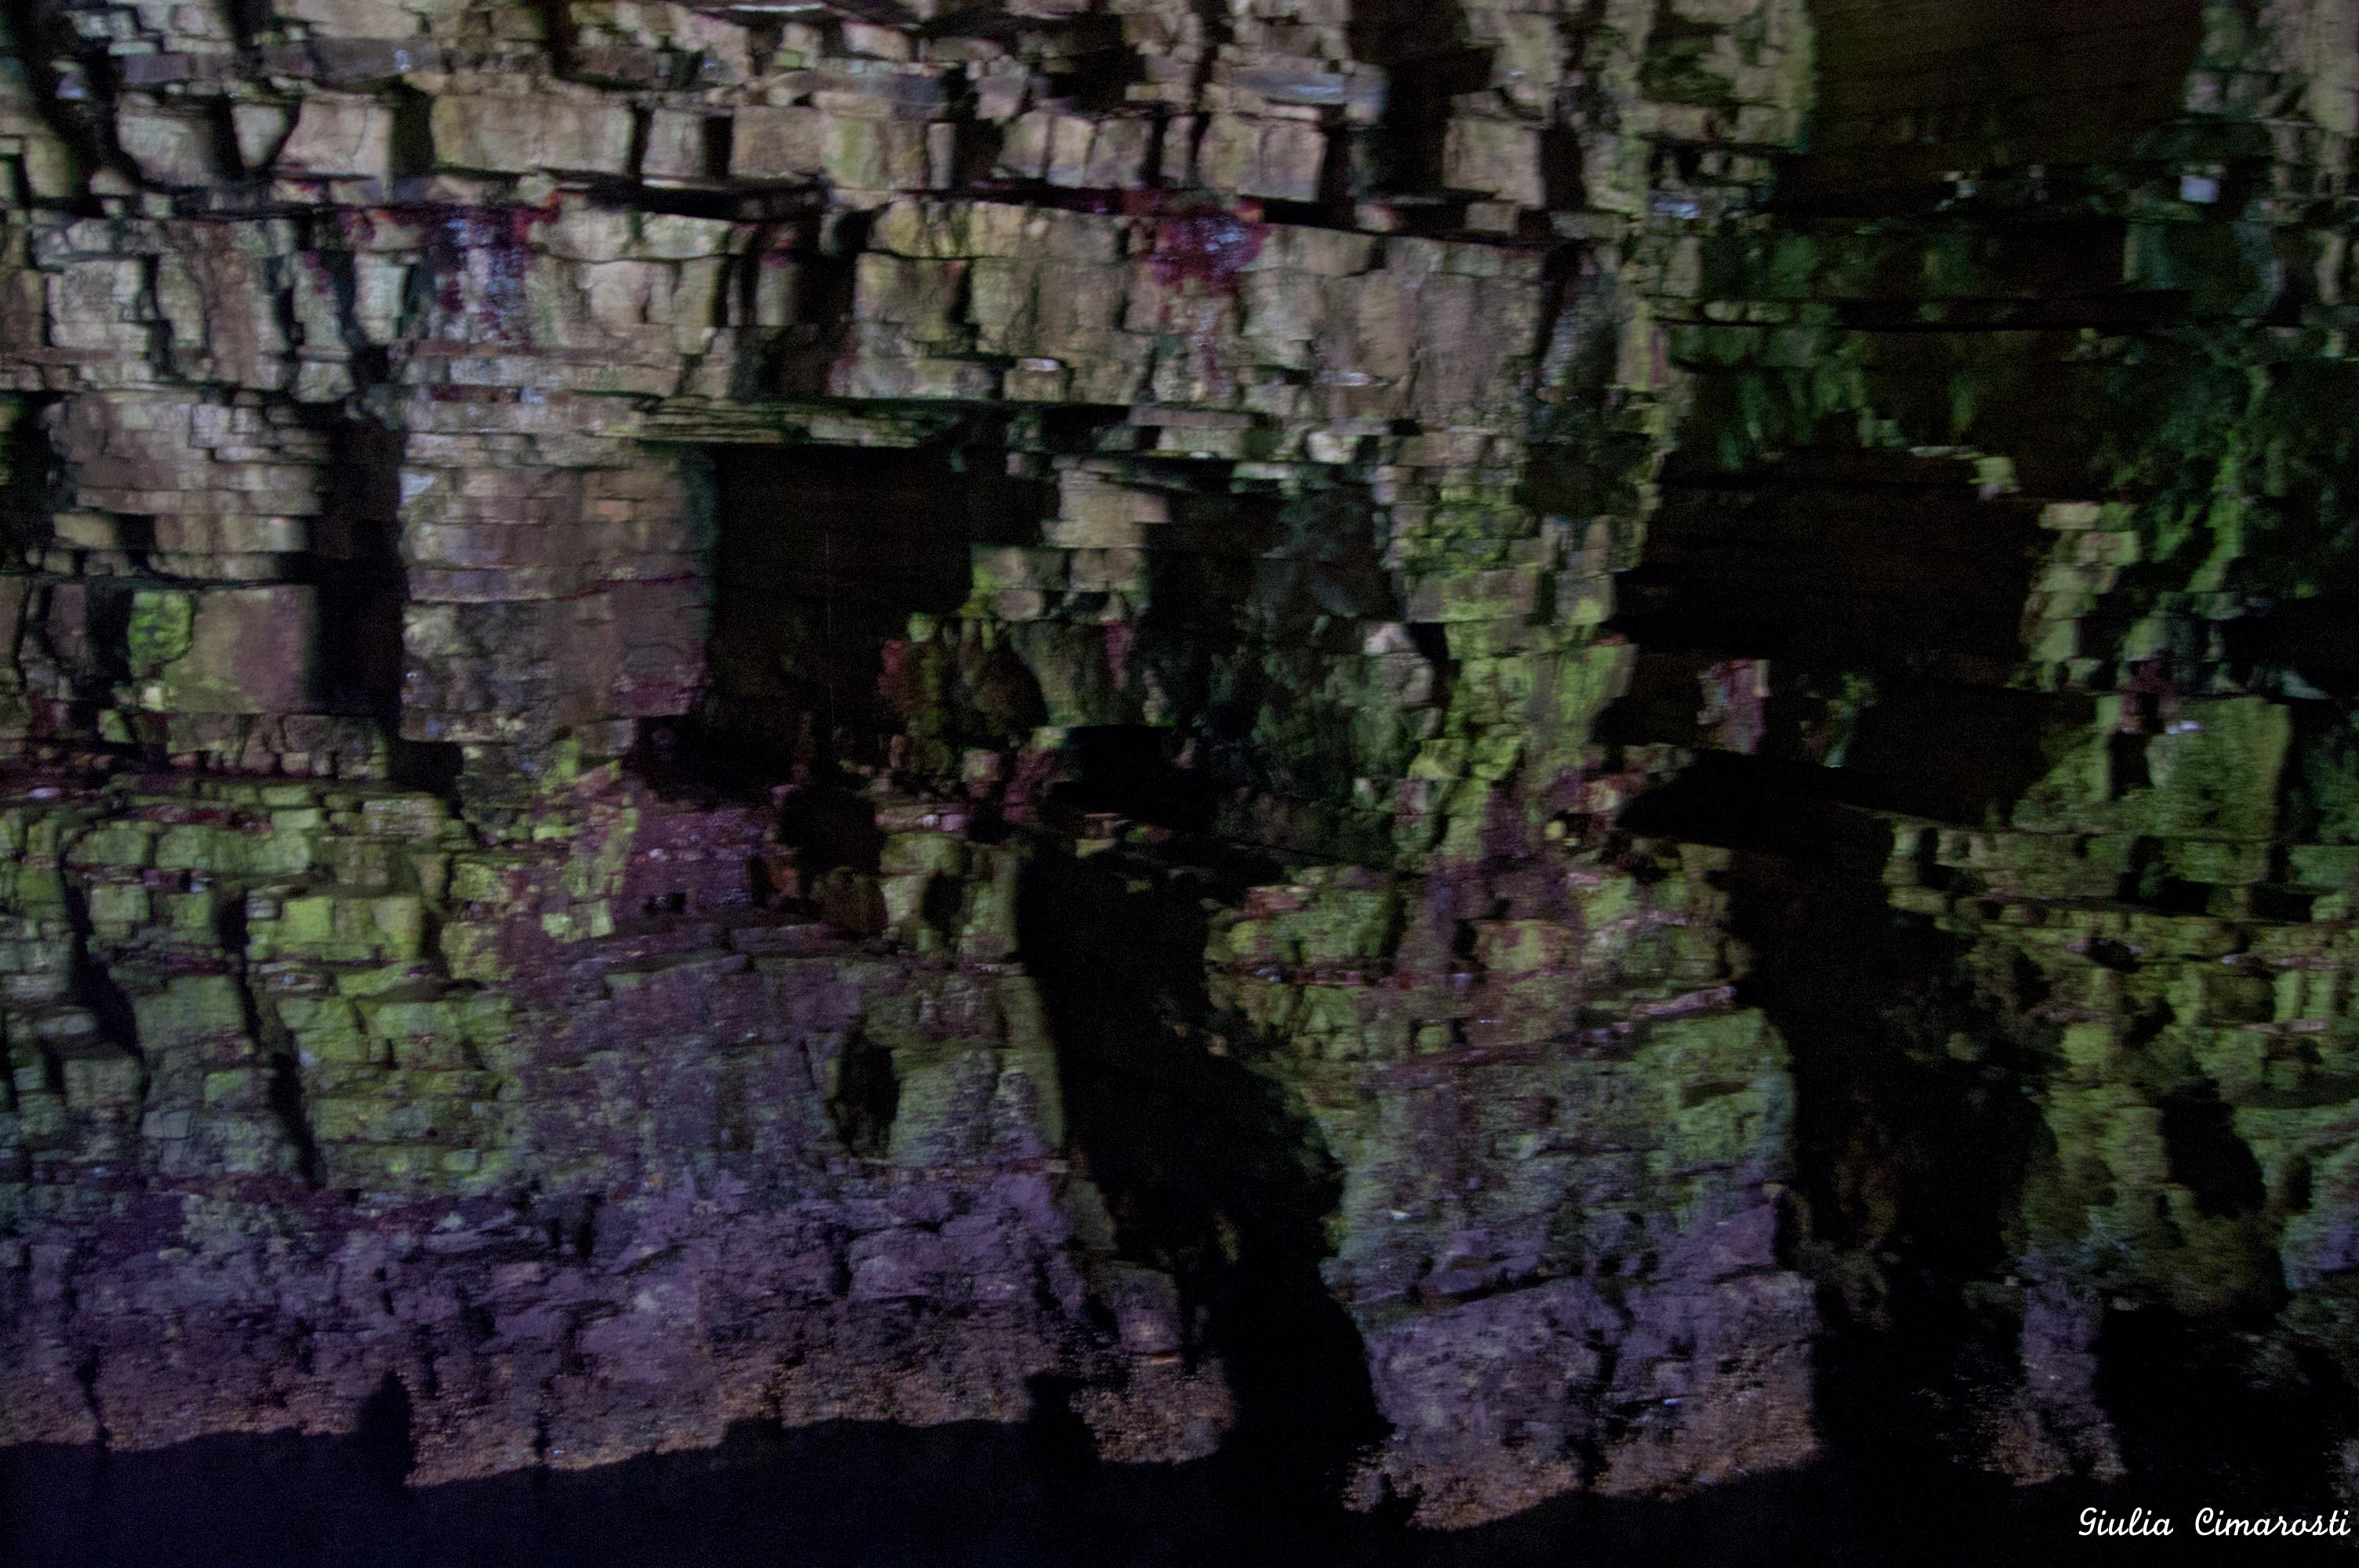 Painter's palette cave, Apulia, Italy